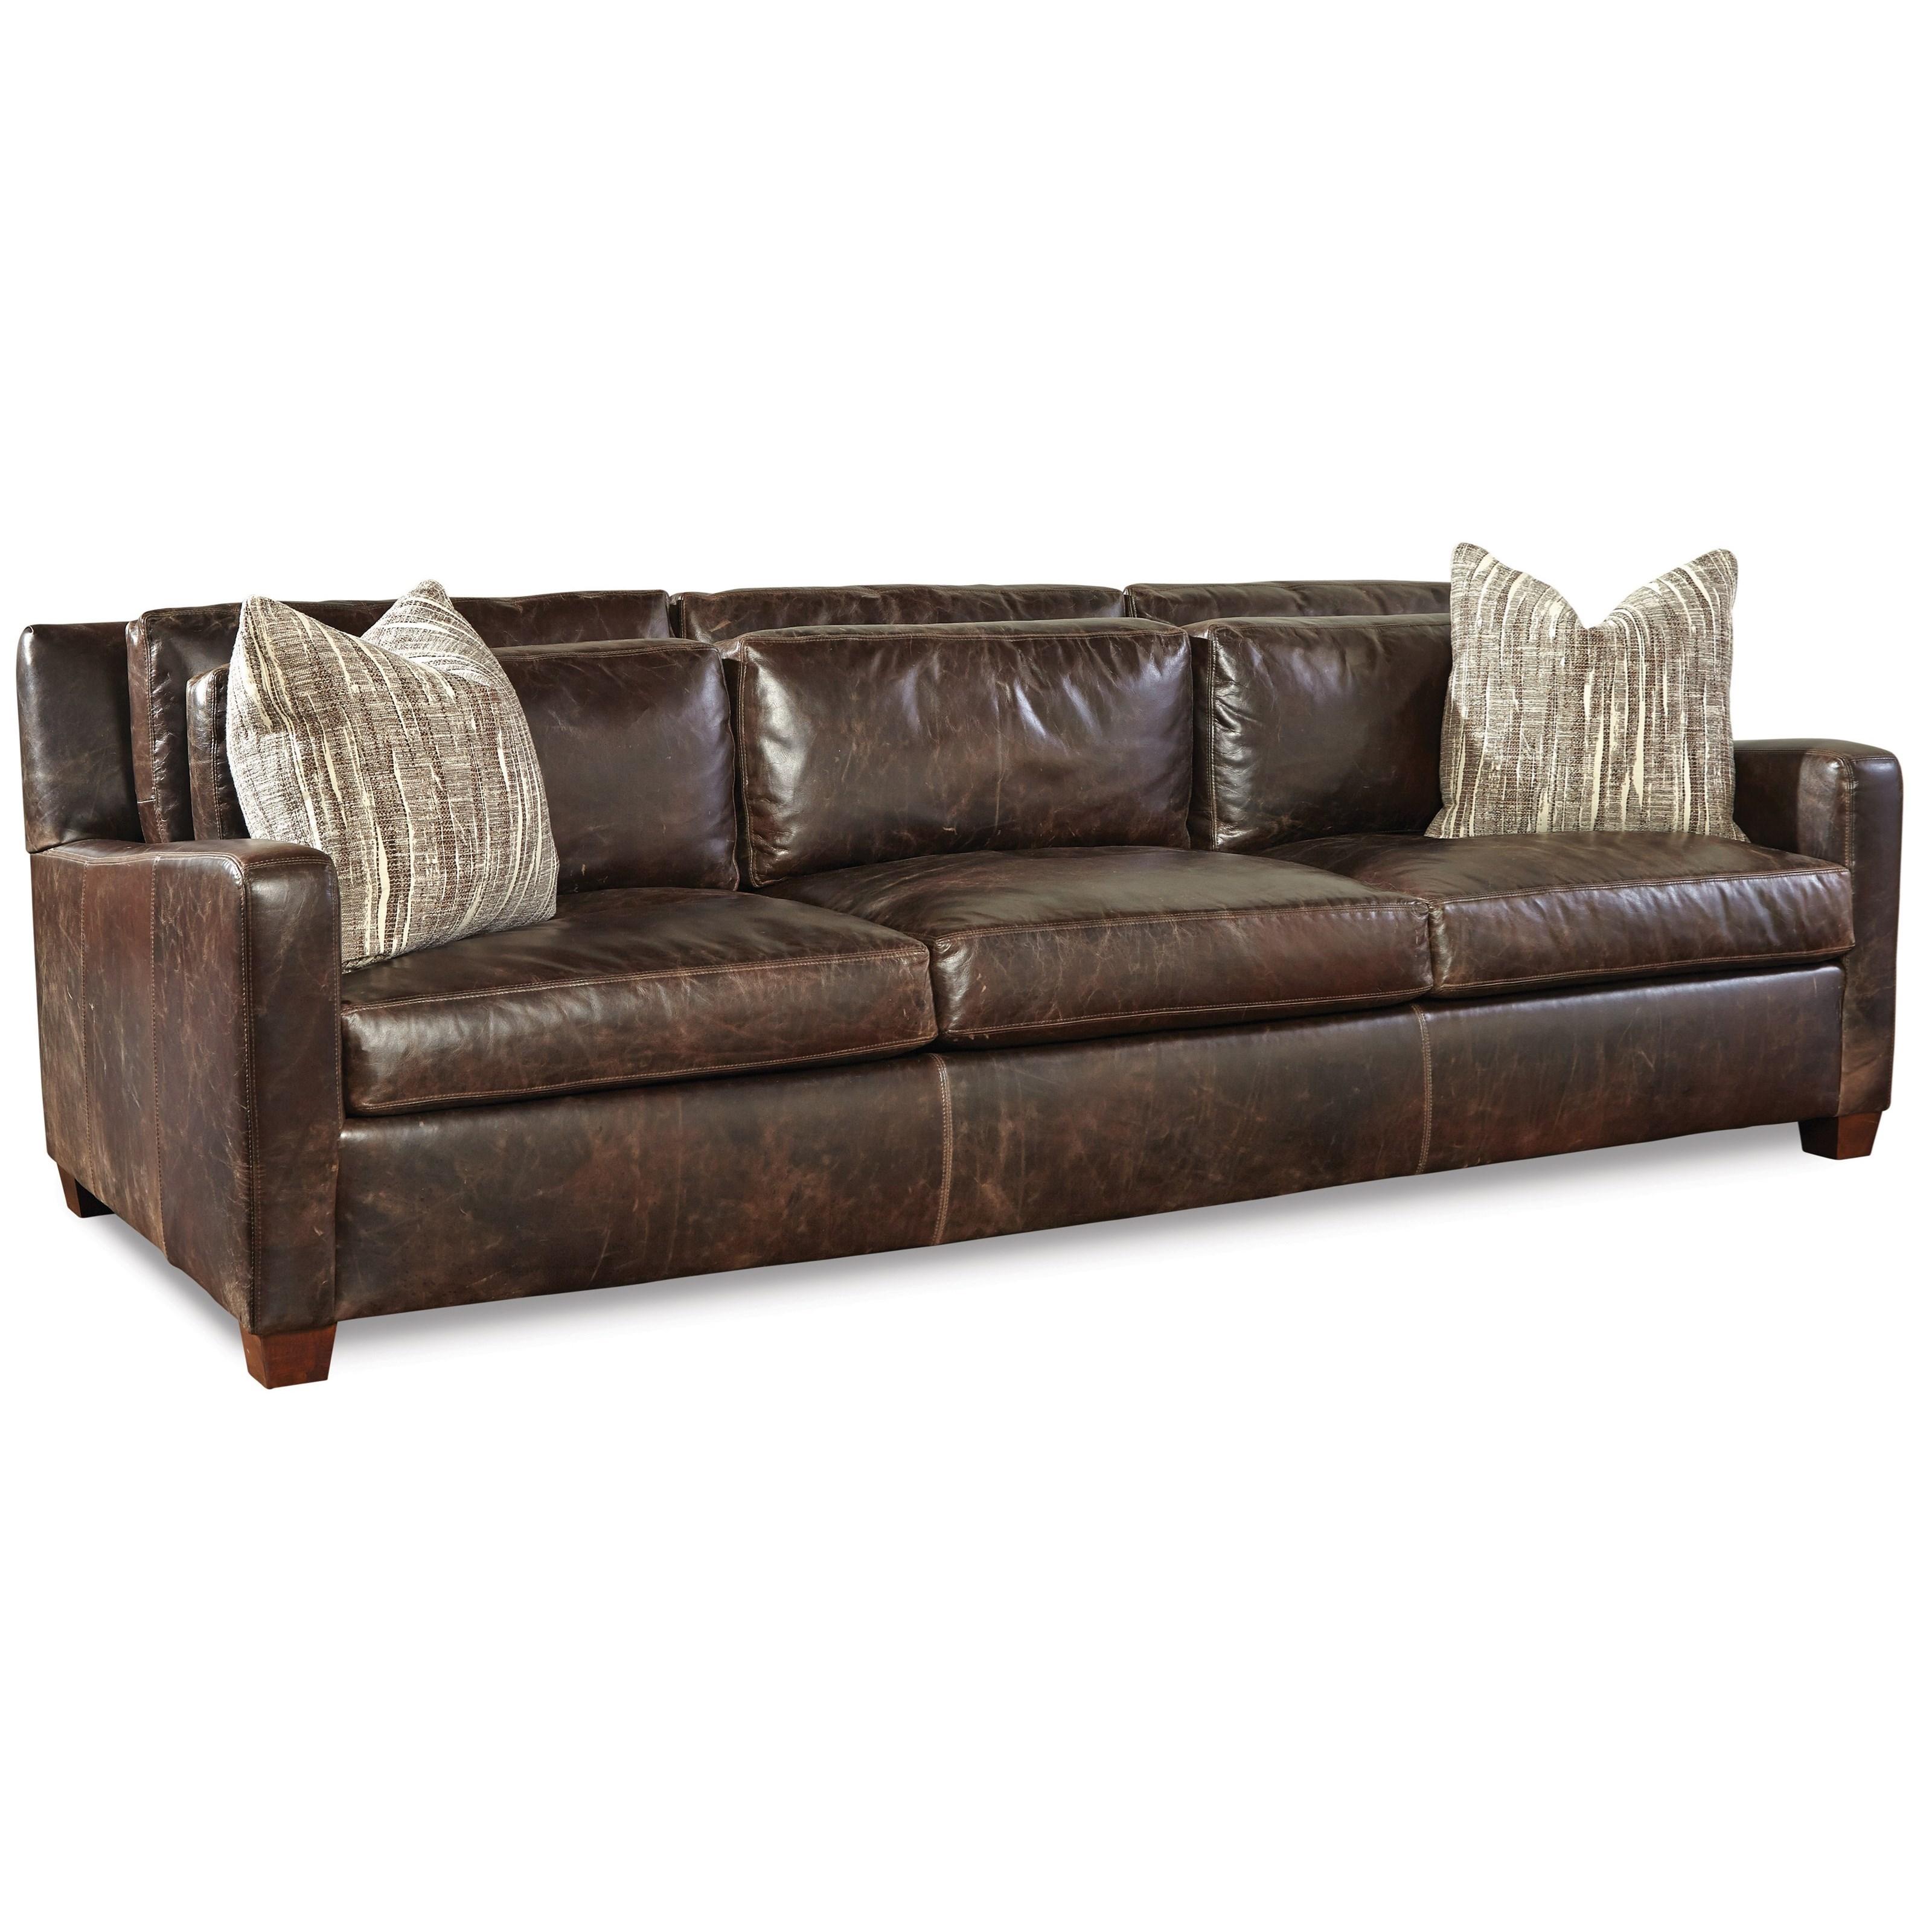 7237 Sofa by Geoffrey Alexander at Sprintz Furniture